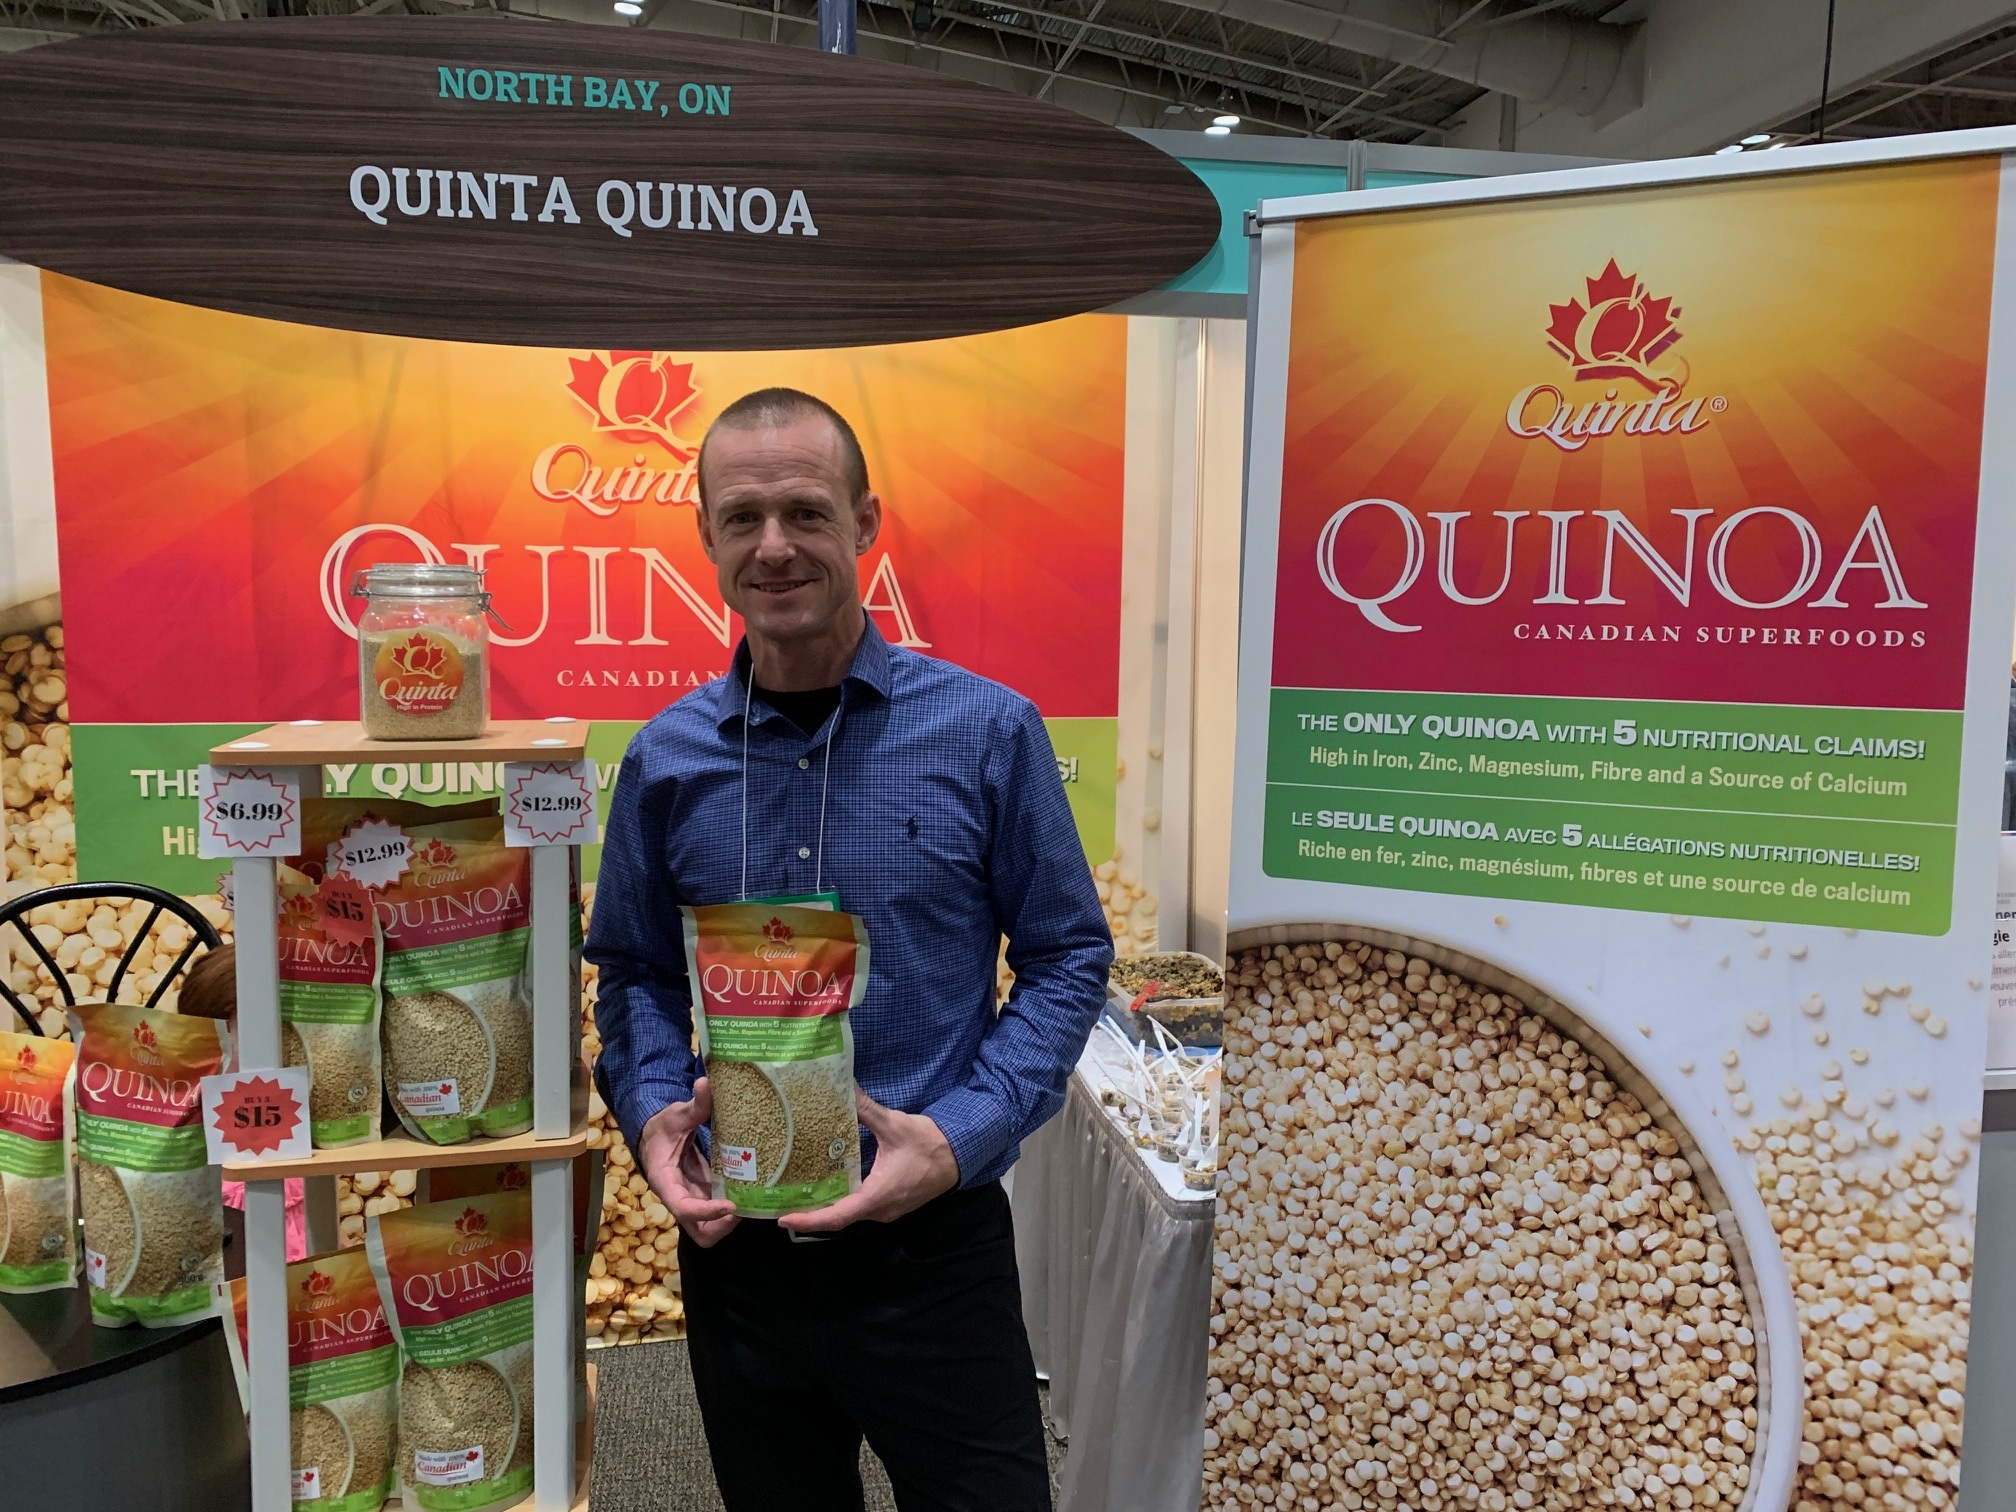 Quinoa processsing plant may be coming to North Bay